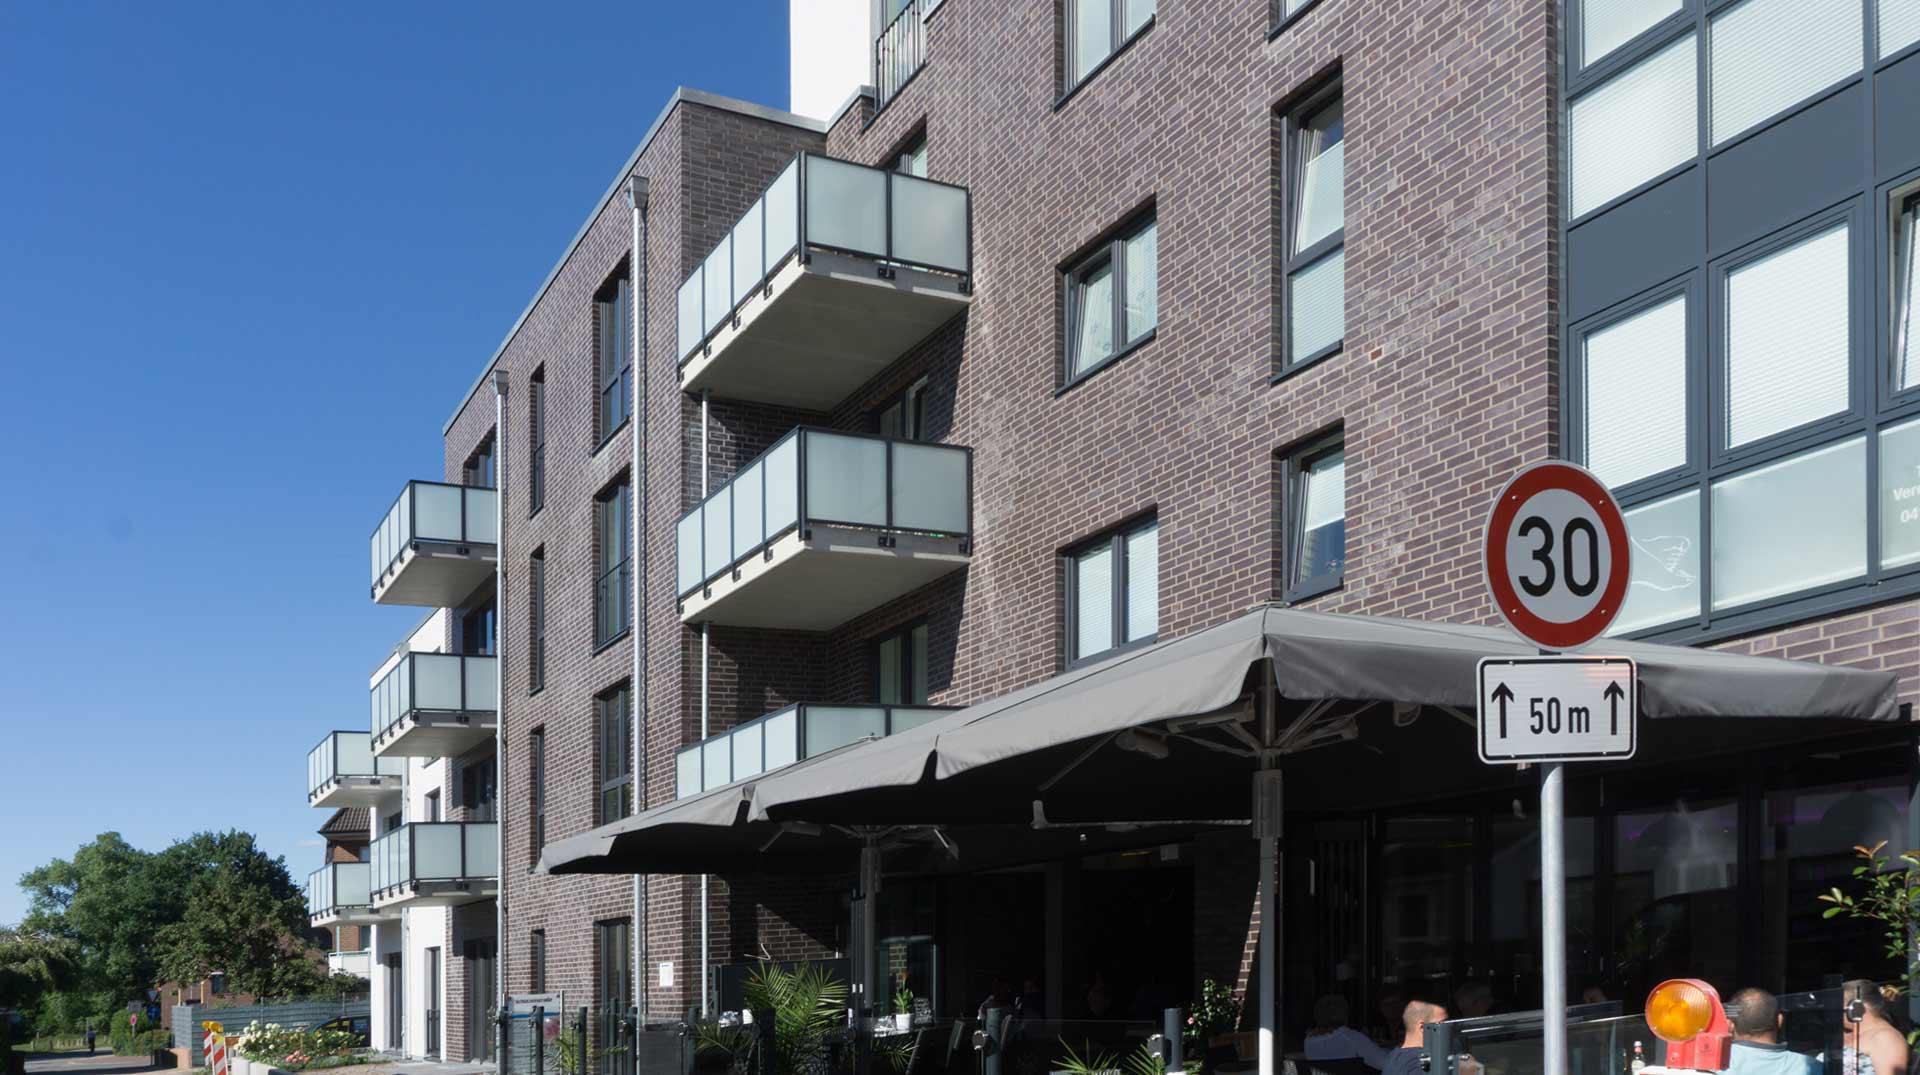 Erfahrenes Baustatik Büro in Schleswig-Holstein